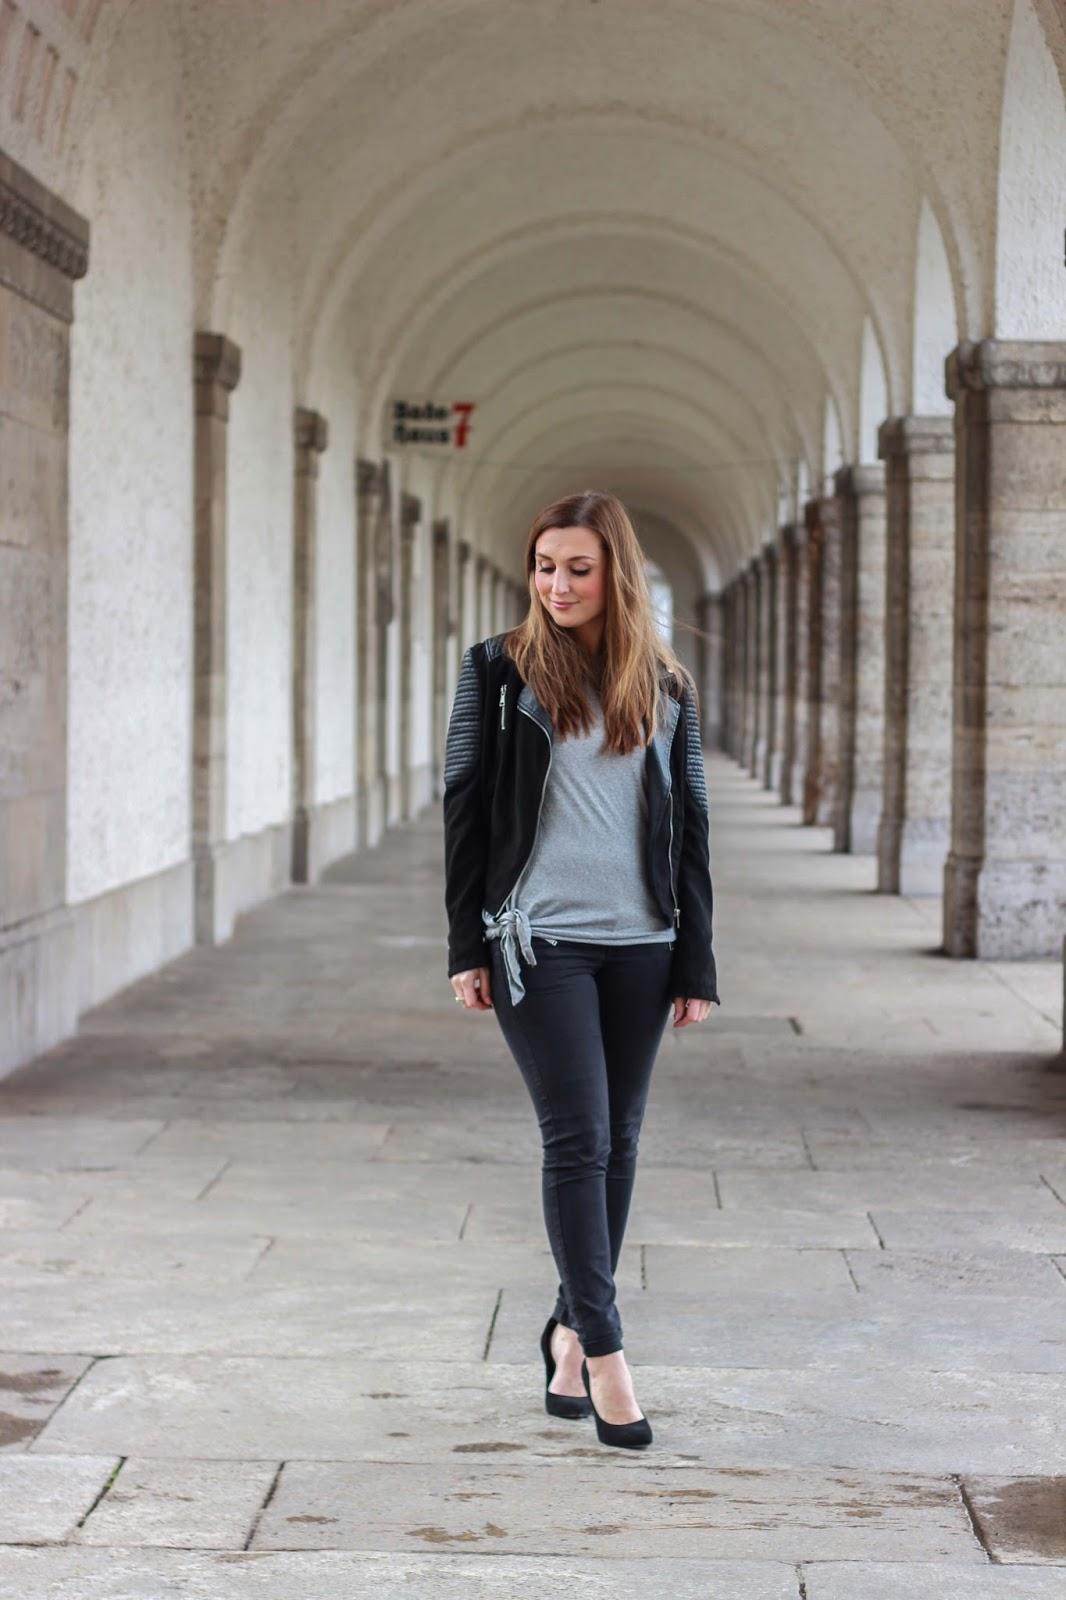 Fashionstylebyjohanna - Biker Jacke - graues Tshirt kombinieren